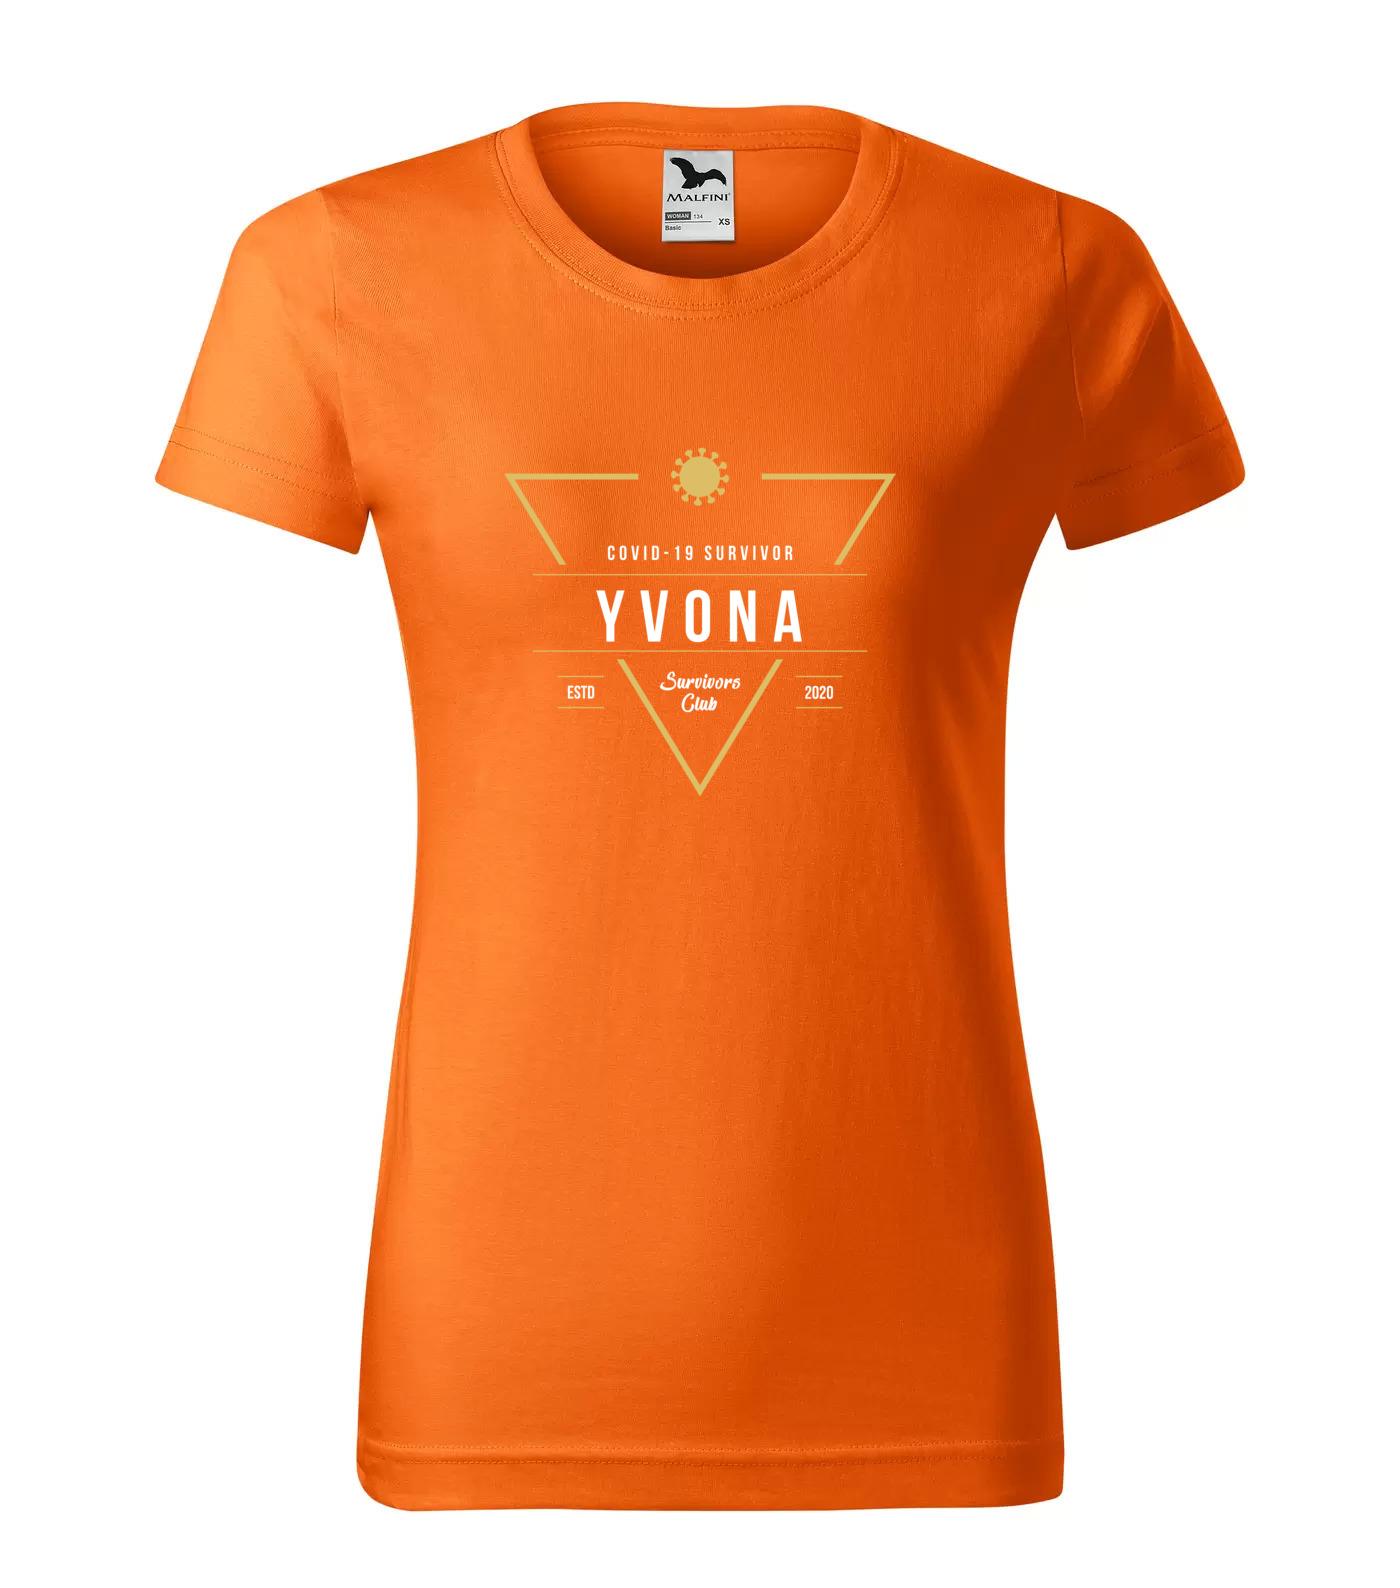 Tričko Survivor Club Yvona